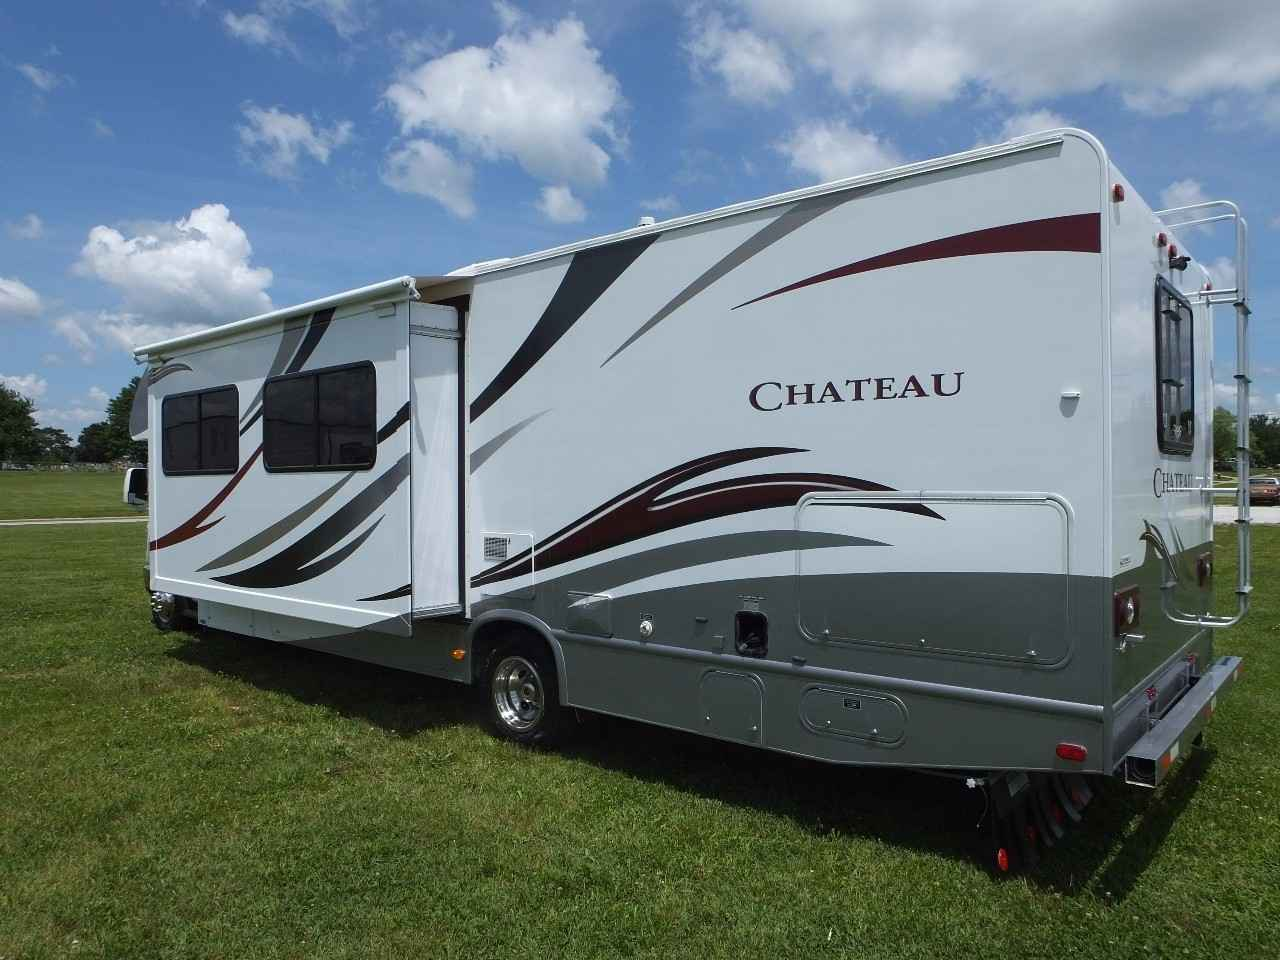 2013 Used Thor Motor Coach Chateau 31l Class C In Missouri Mo